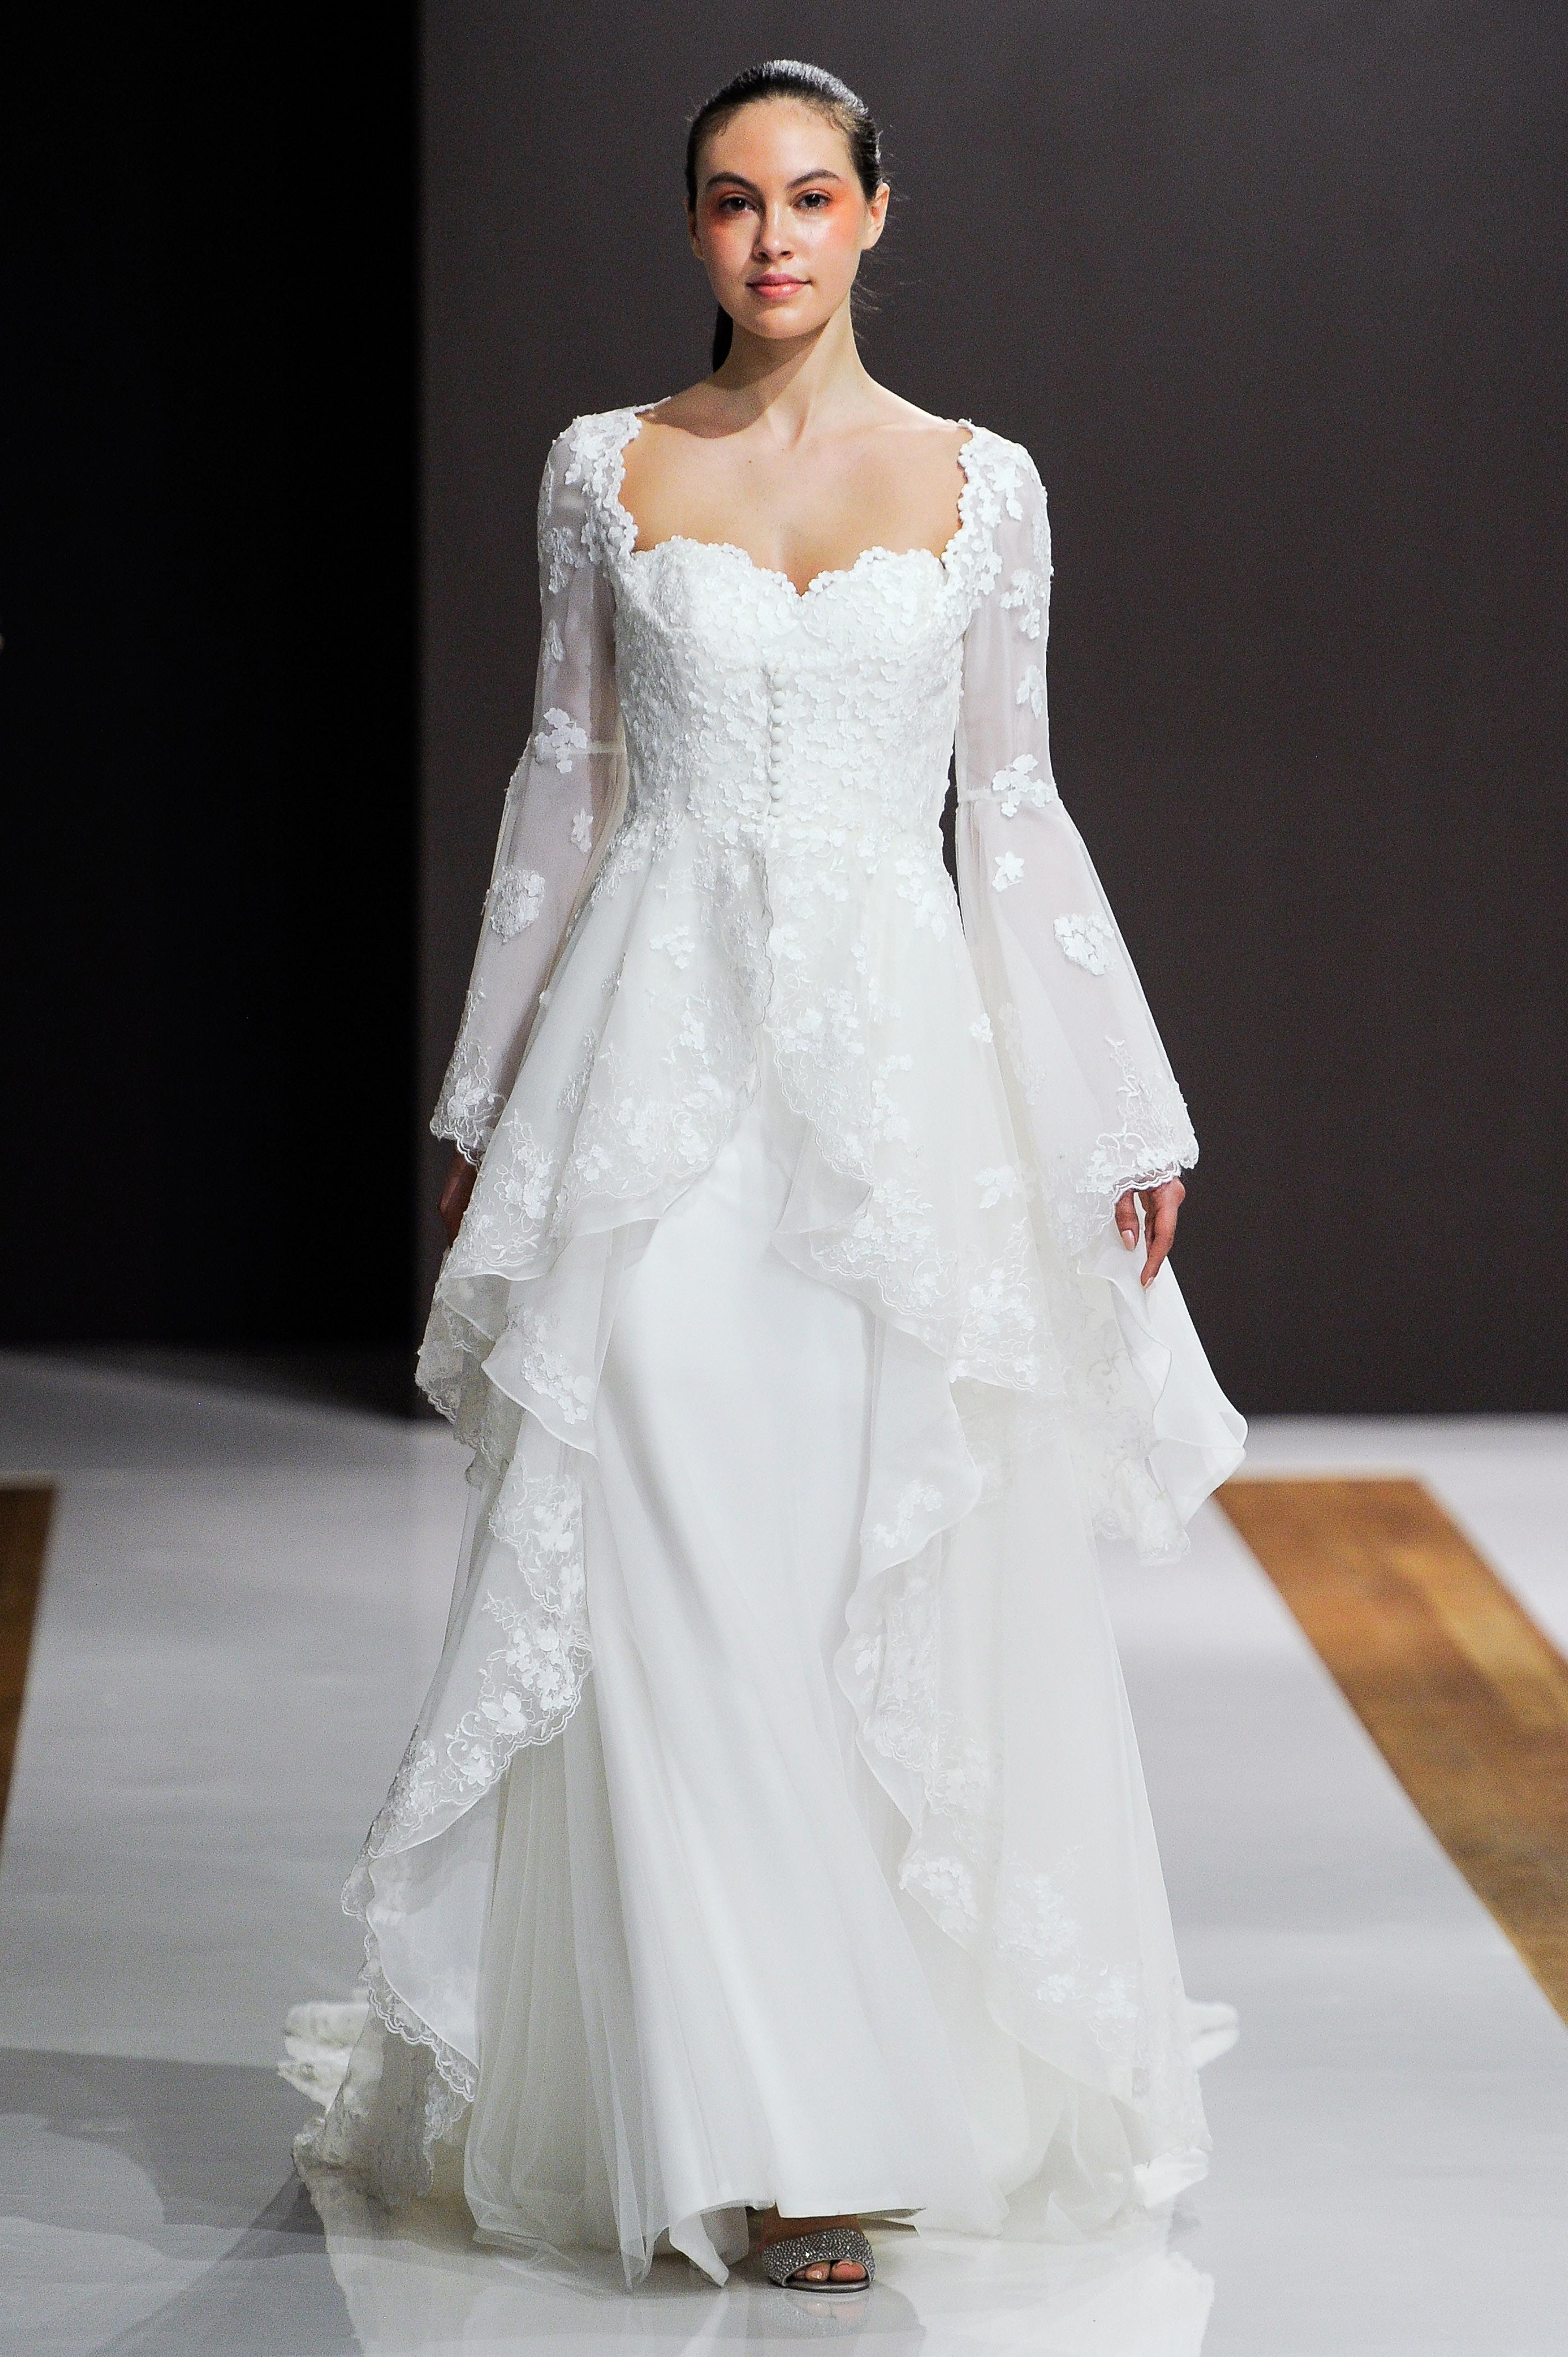 mark zunino wedding dress fall 2018 long bell sleeves ruffle lace